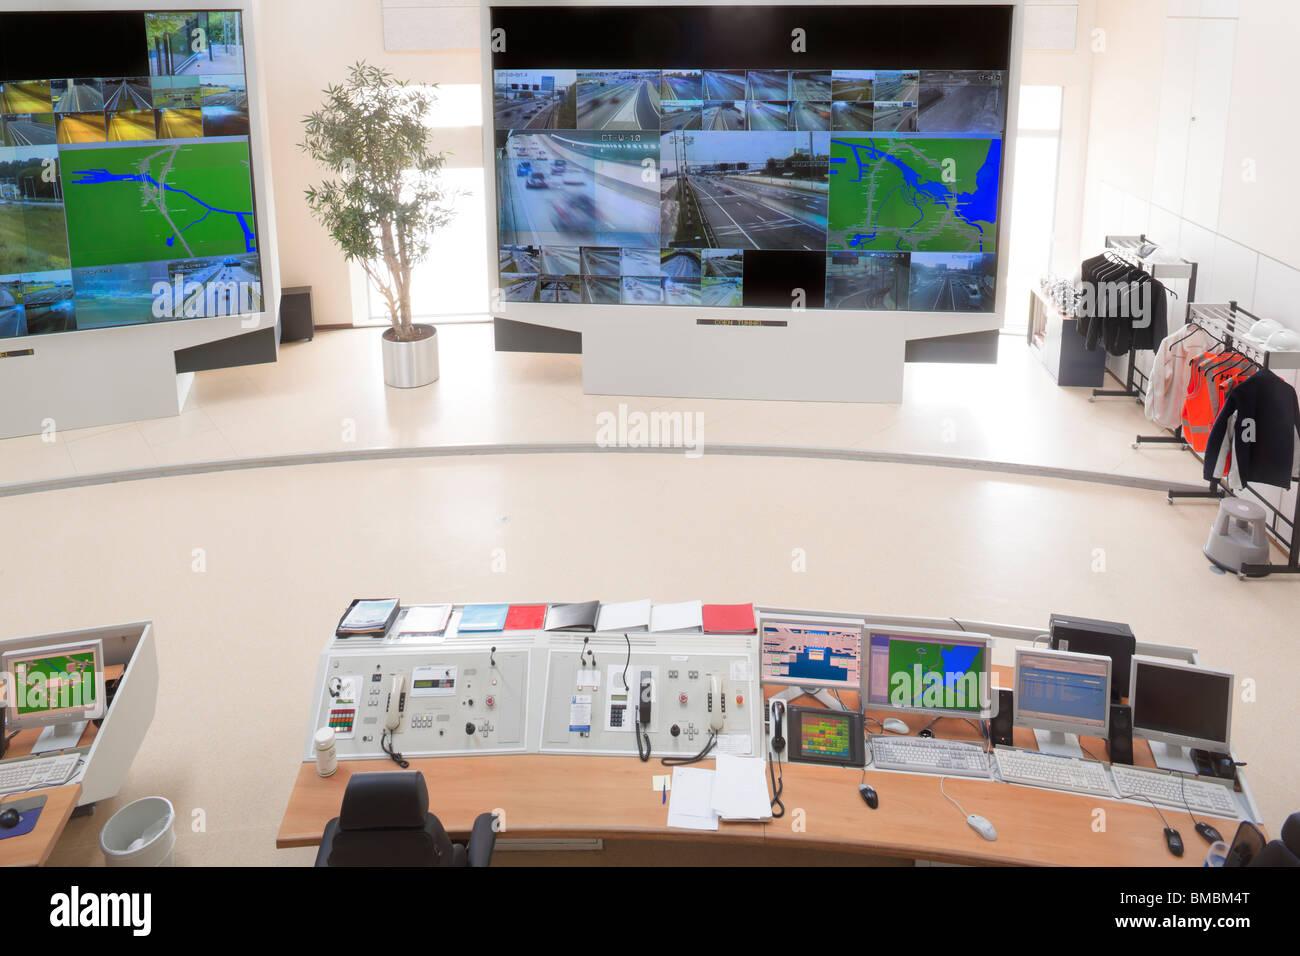 Highway, motorway traffic management system cctv surveillance control room vidiwall monitors. Wijde Blik Velsen - Stock Image